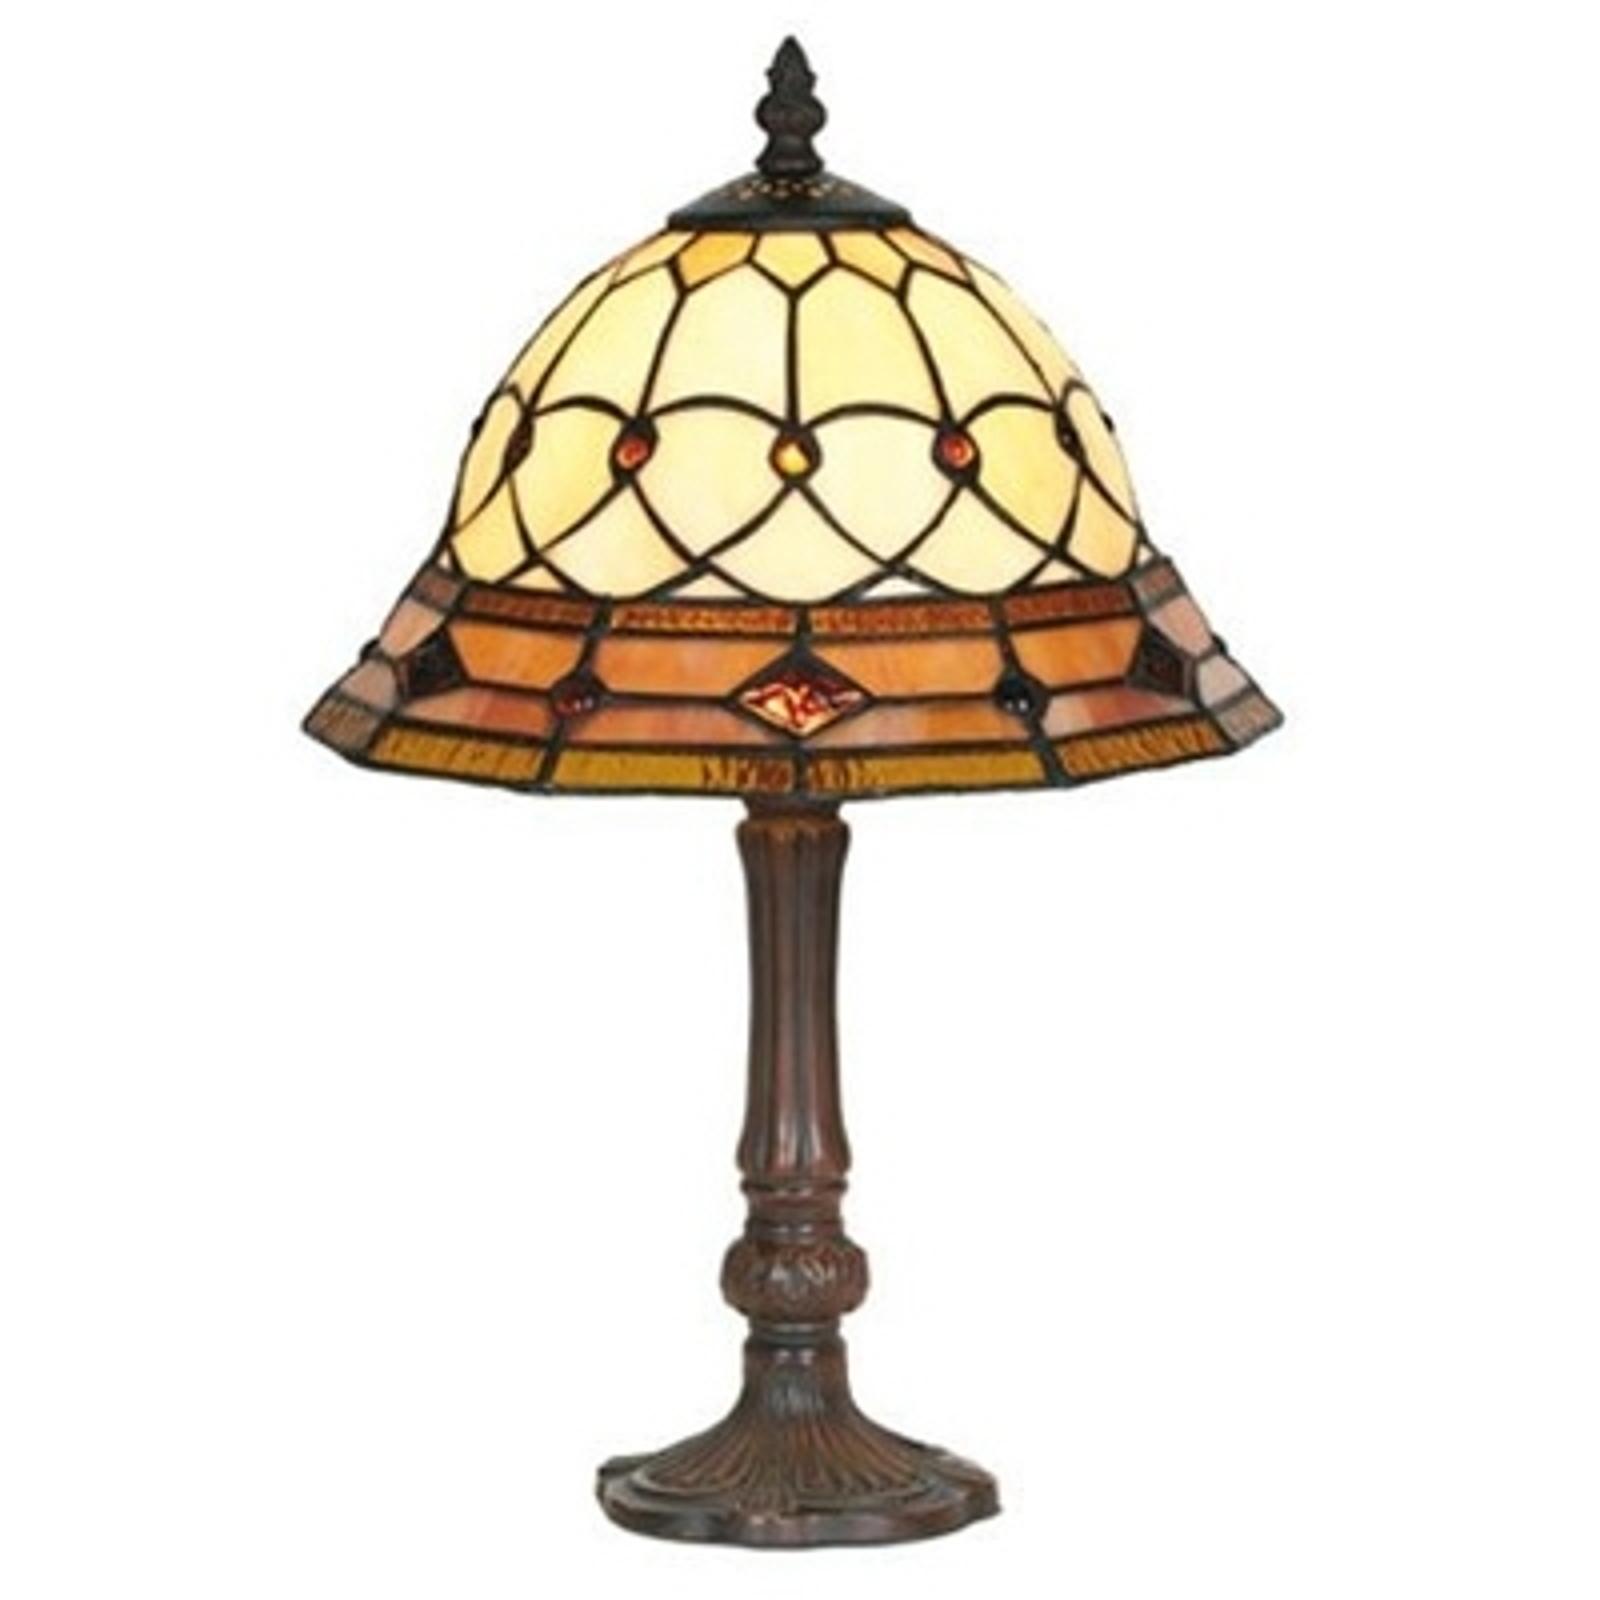 Handgemaakte tafellamp KASSANDRA 42 cm